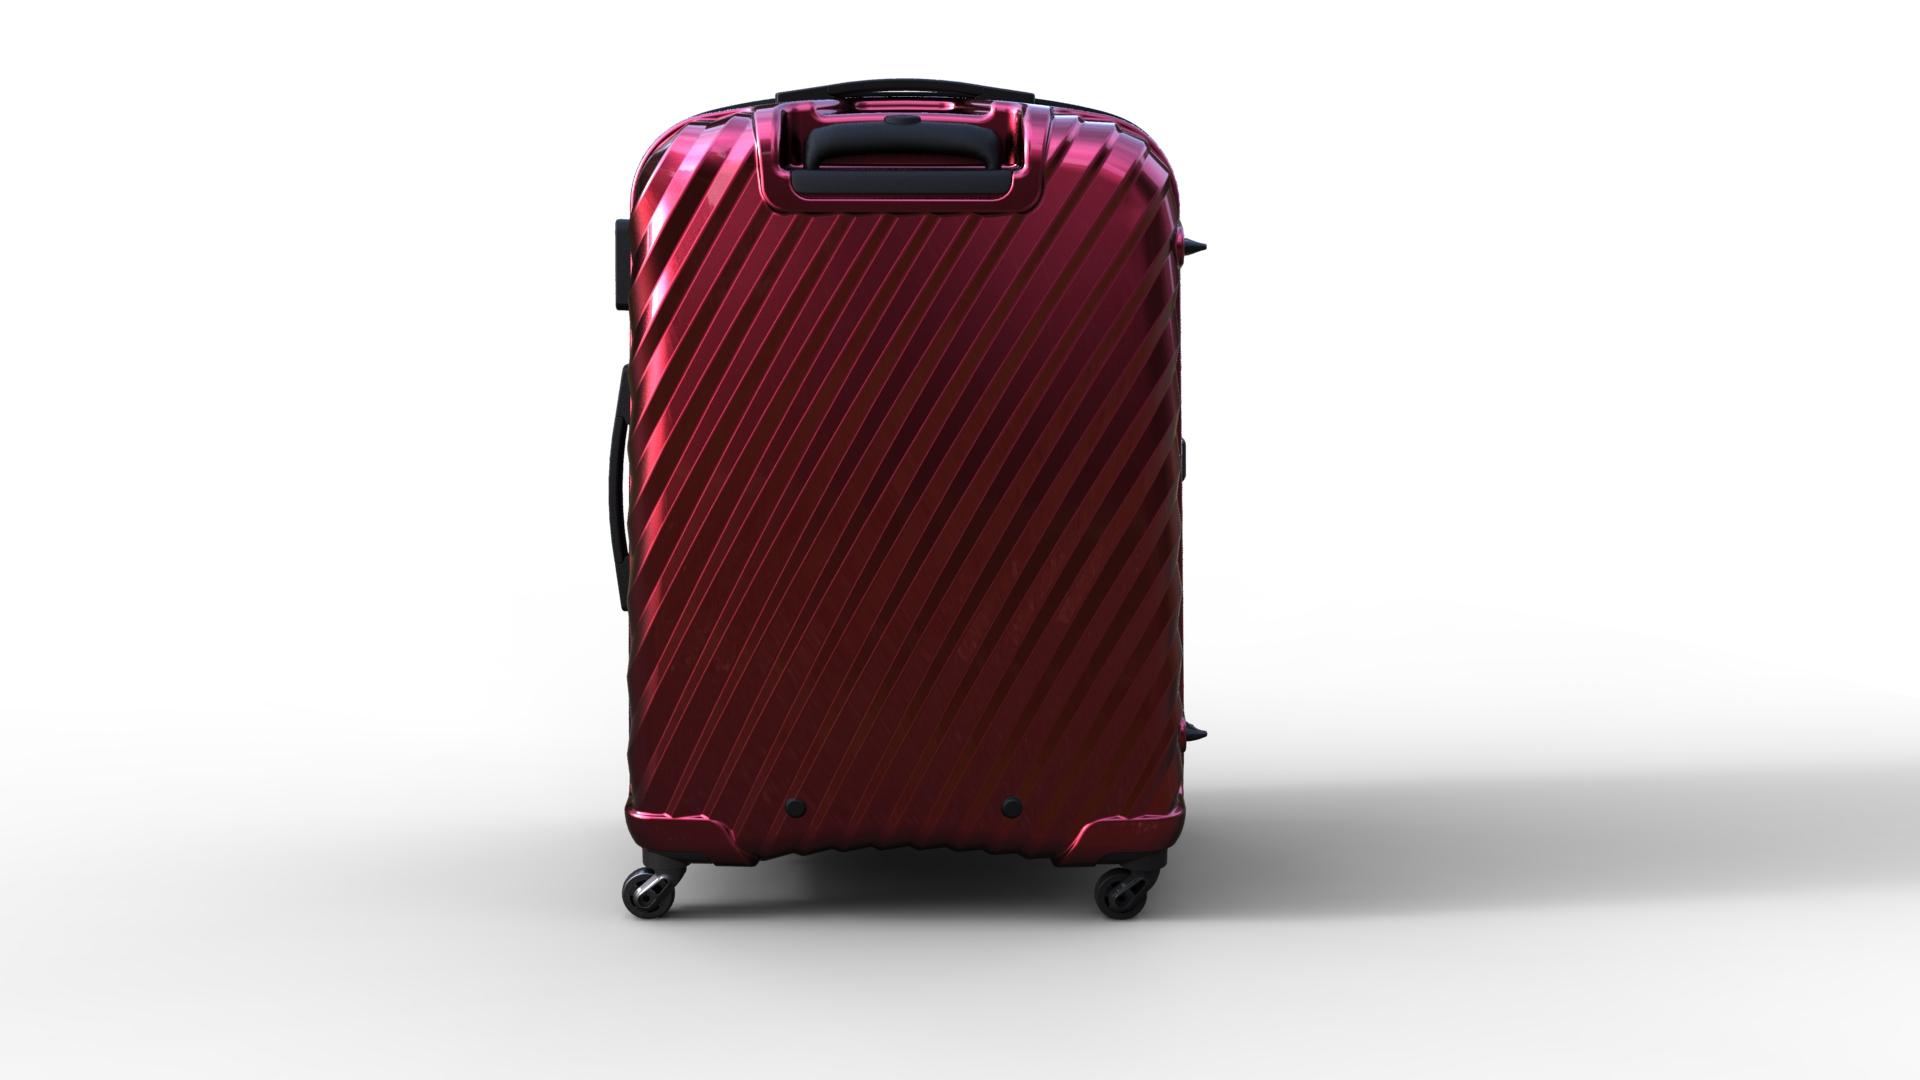 trolley suitcase bag 03 3d model max fbx ma mb obj 286000